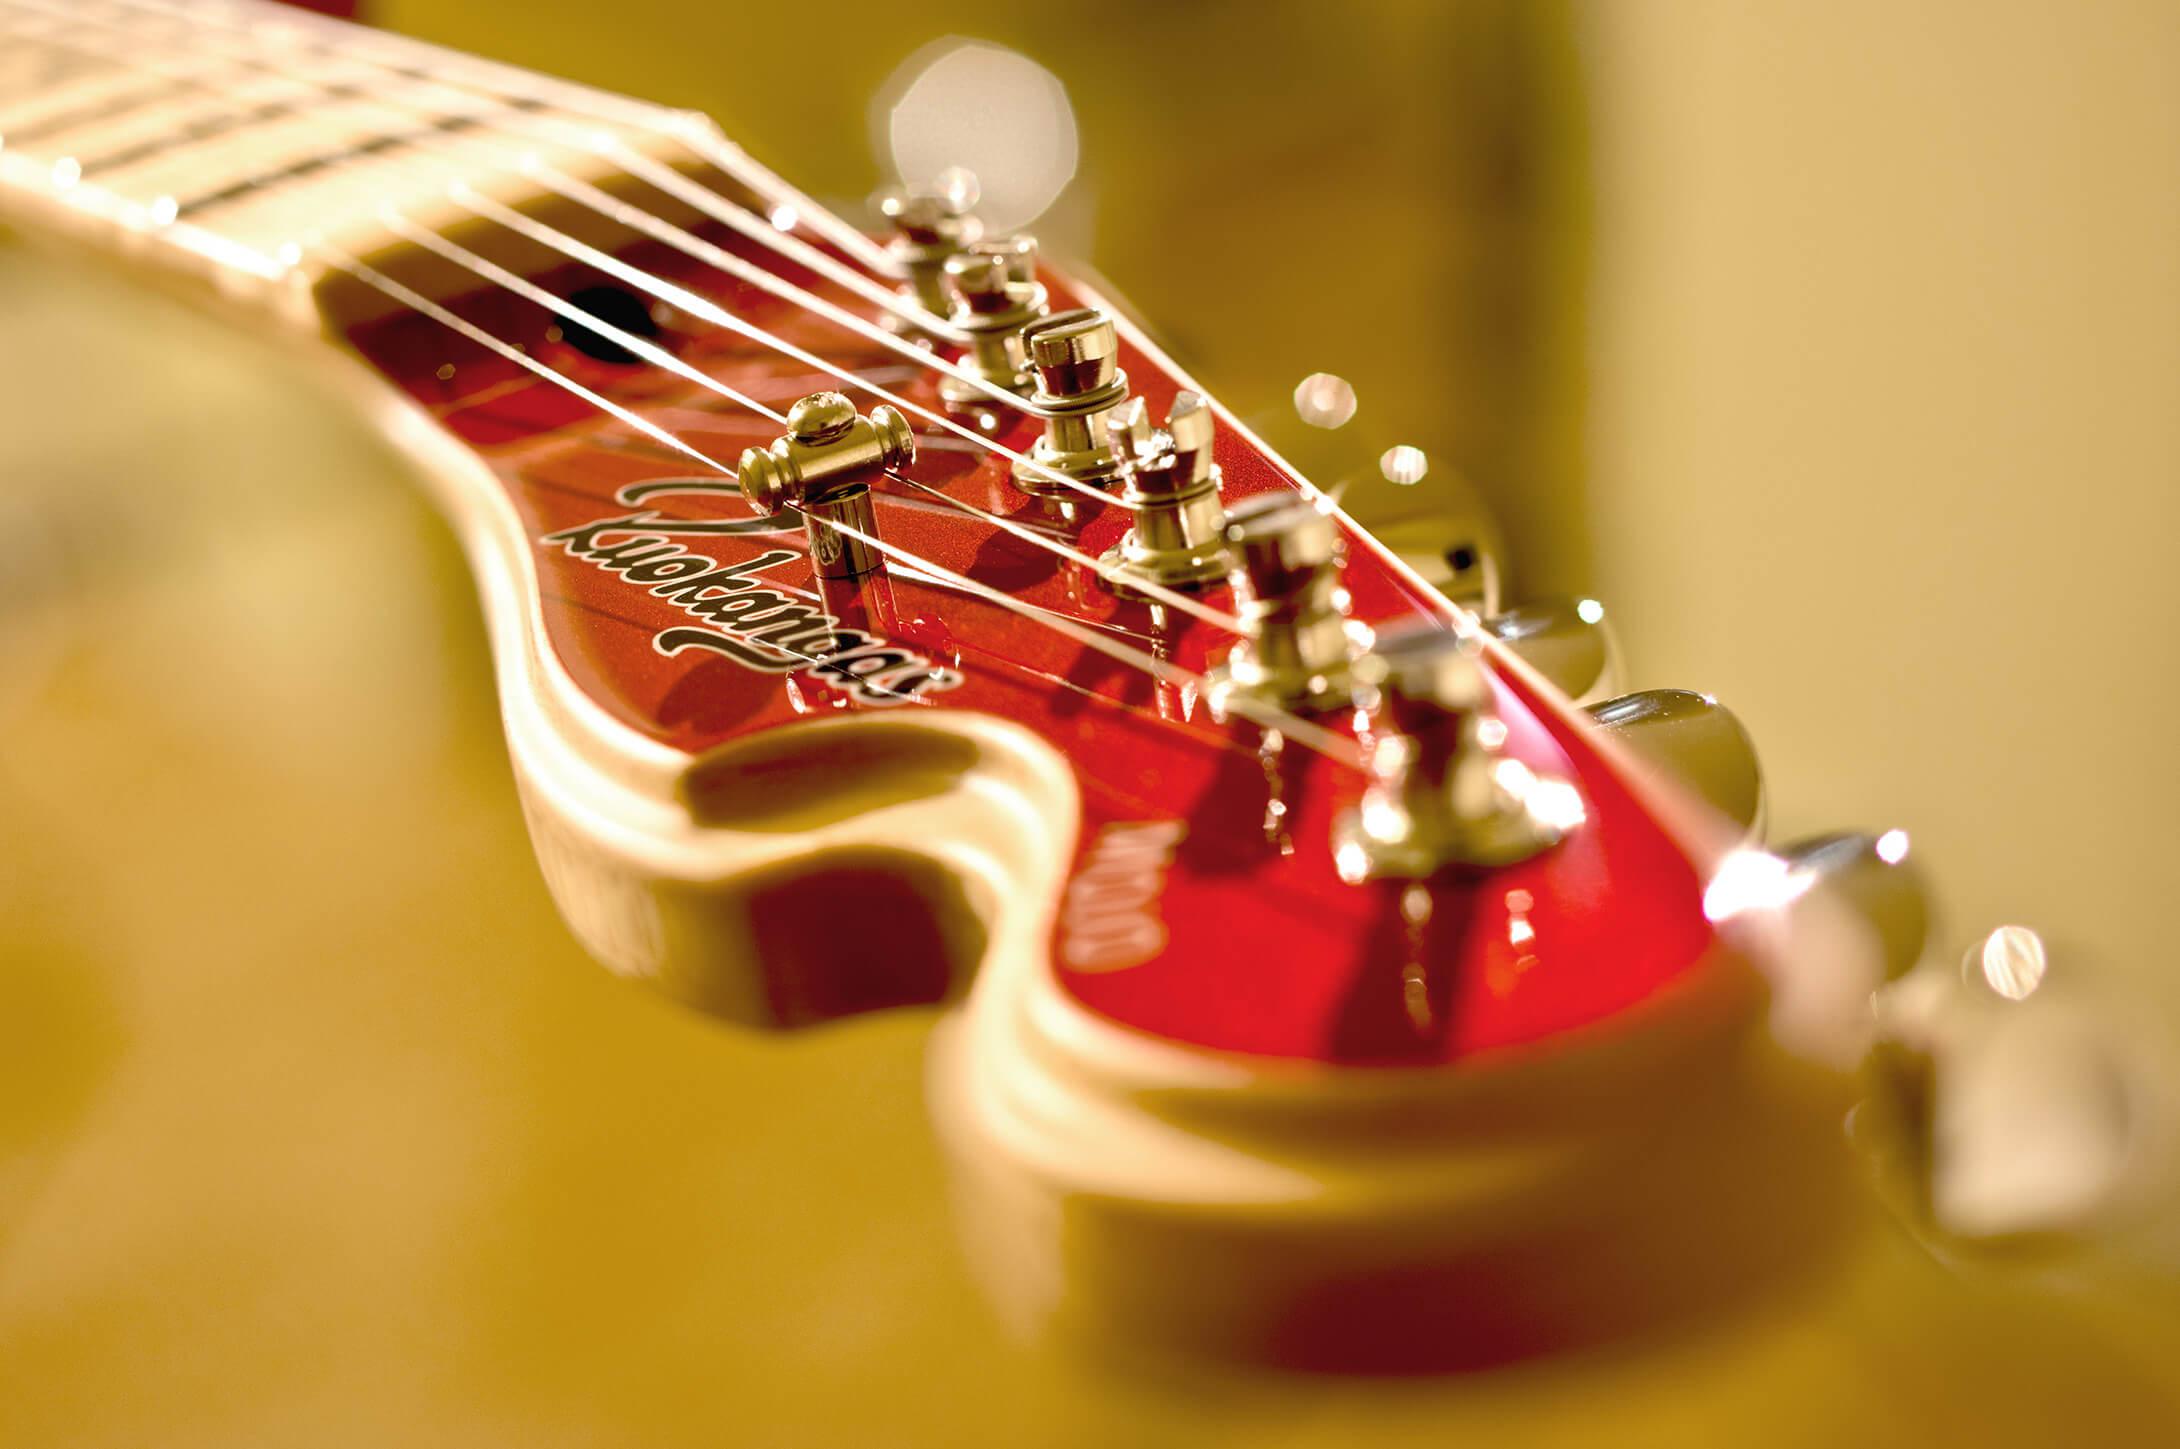 Ruokangas Guitars - Harviala